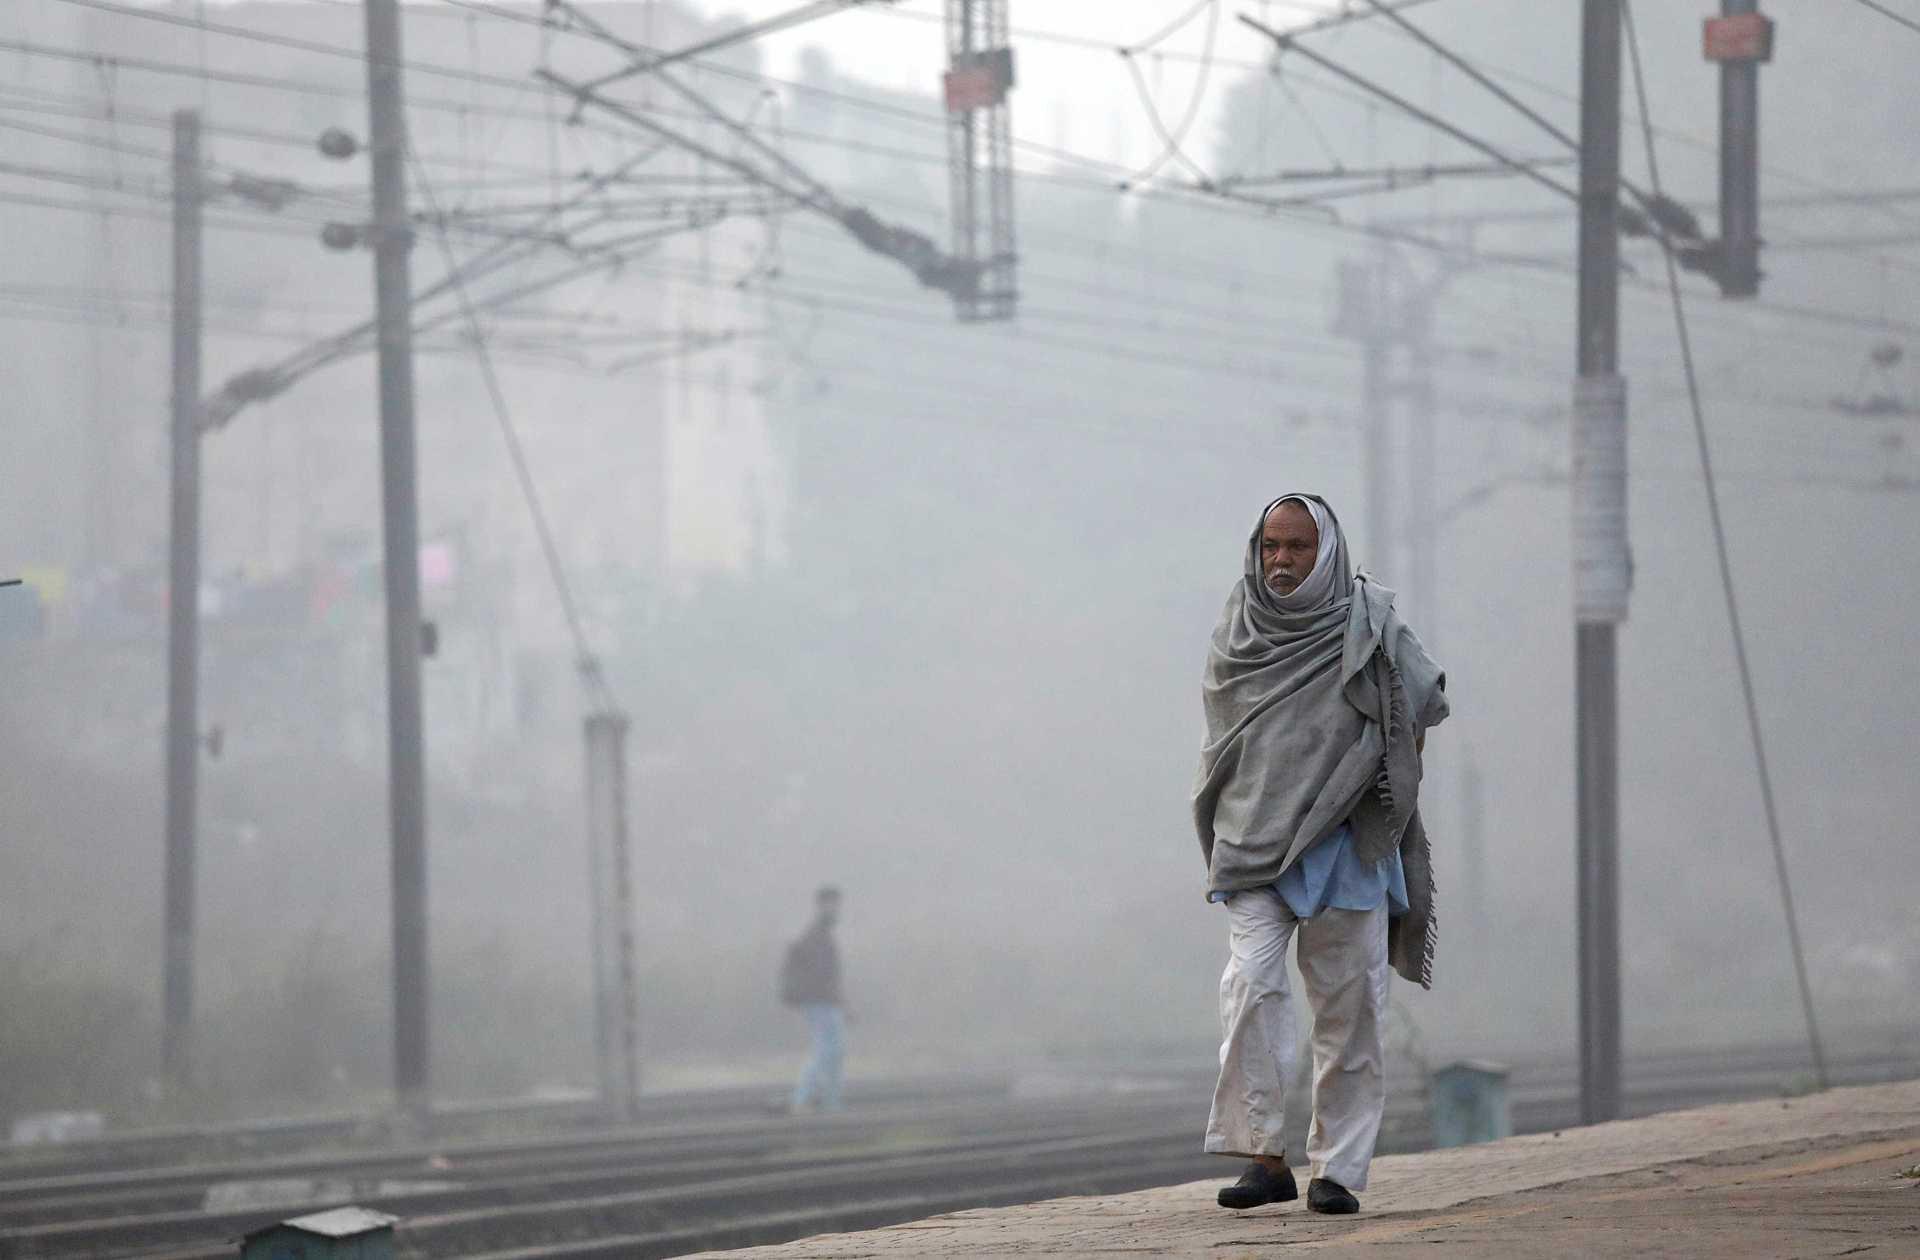 A man walks along a railway platform on a smoggy morning in New Delhi, India, November 10, 2017. REUTERS/Saumya Khandelwal